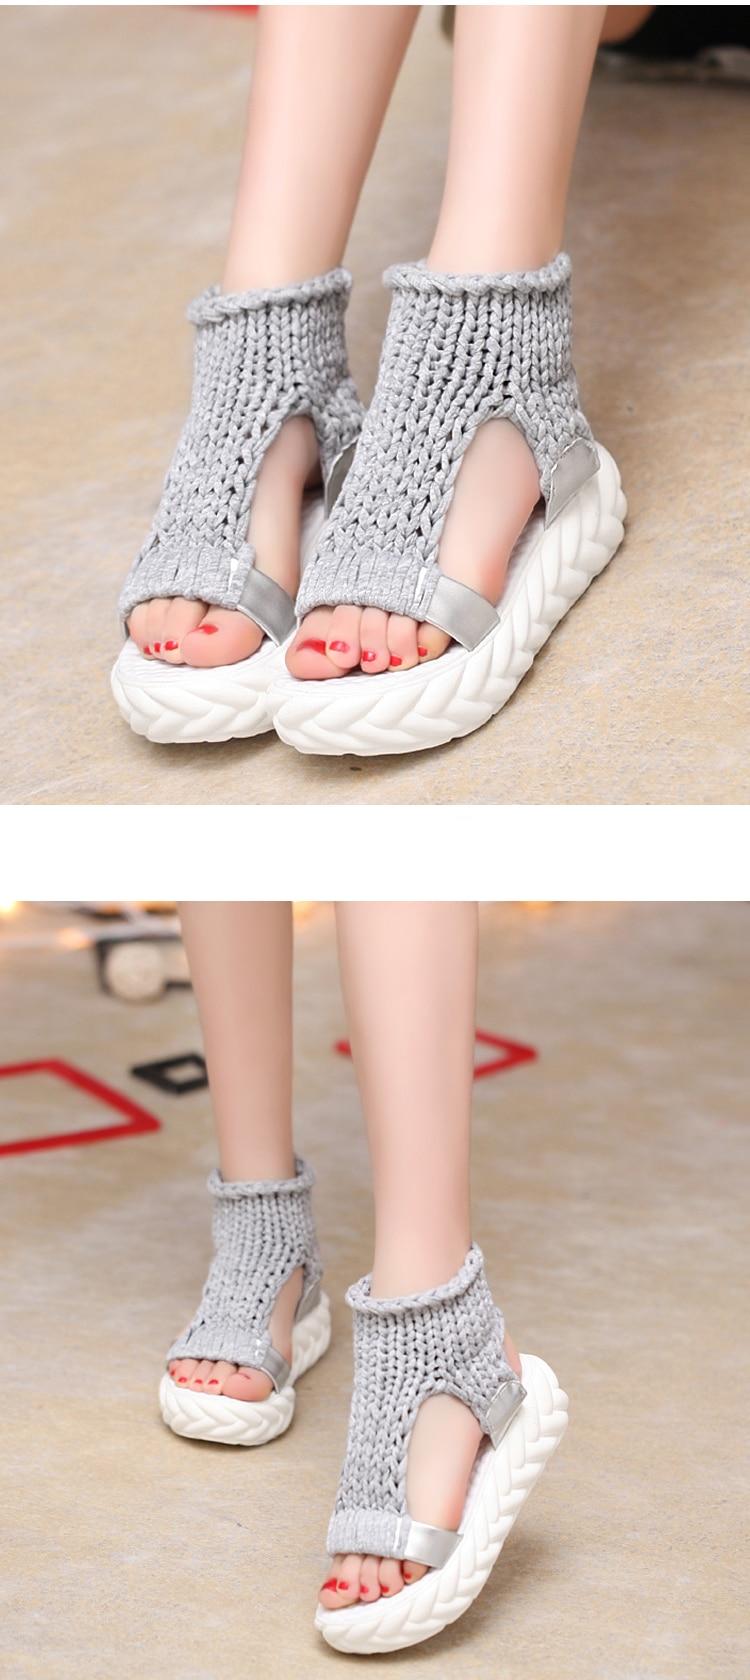 2019 New Casual Summer Shoes Women Comfortable Wool Ladies Platform Sandals Knit High Heels Grey Rose Red Sandales